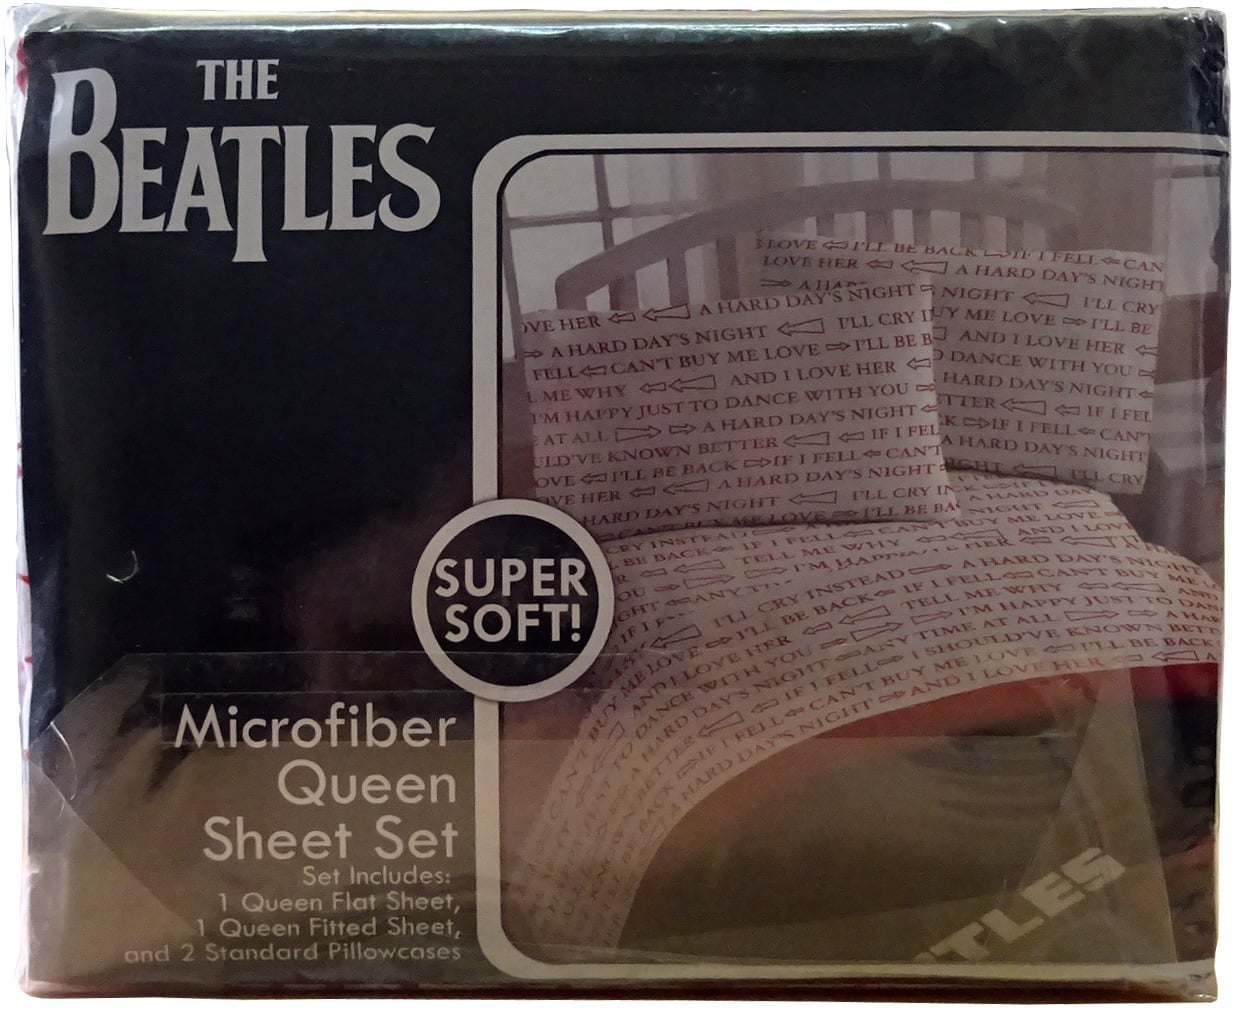 Beatles Bettwäsche A Hard Days Night Songs Beatles Museumbeatles